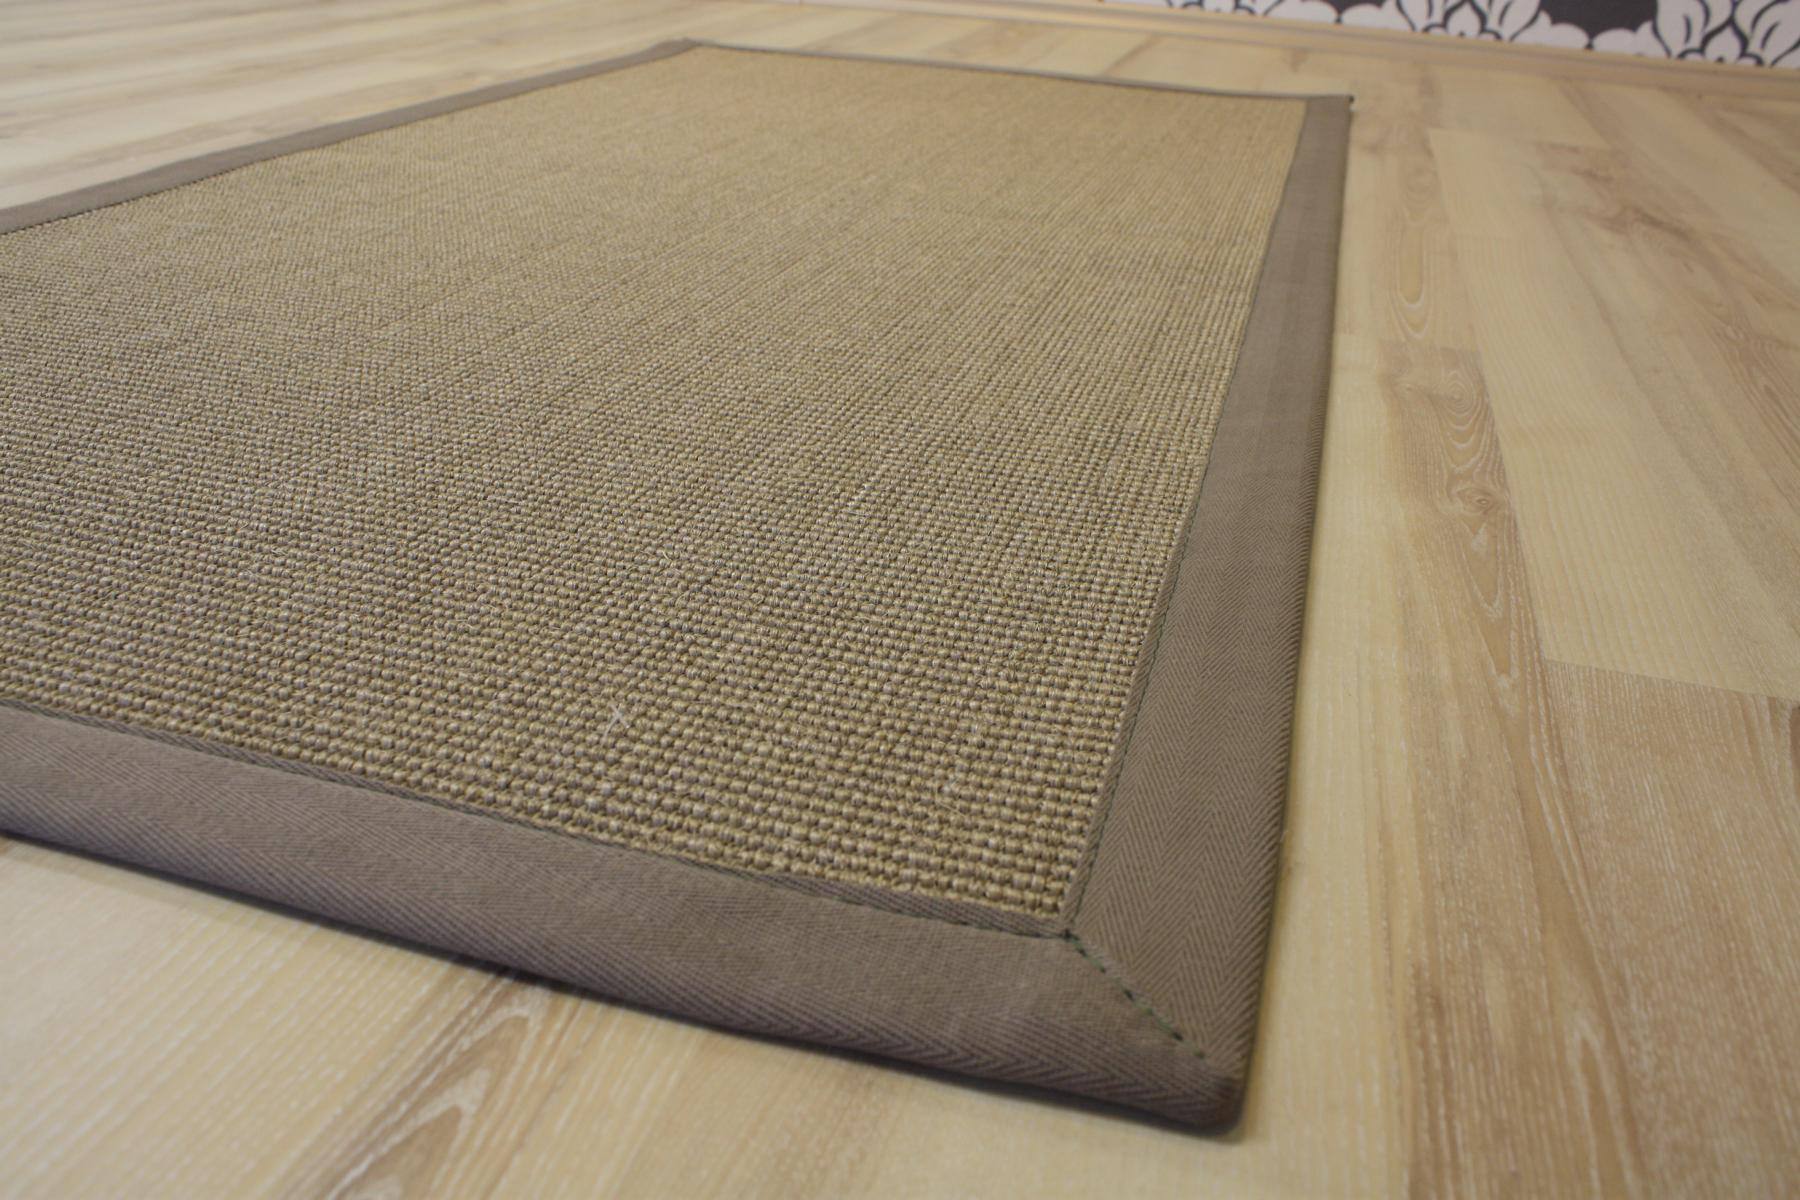 sisal teppich salvador mit bord re creme stein 300x400 cm. Black Bedroom Furniture Sets. Home Design Ideas